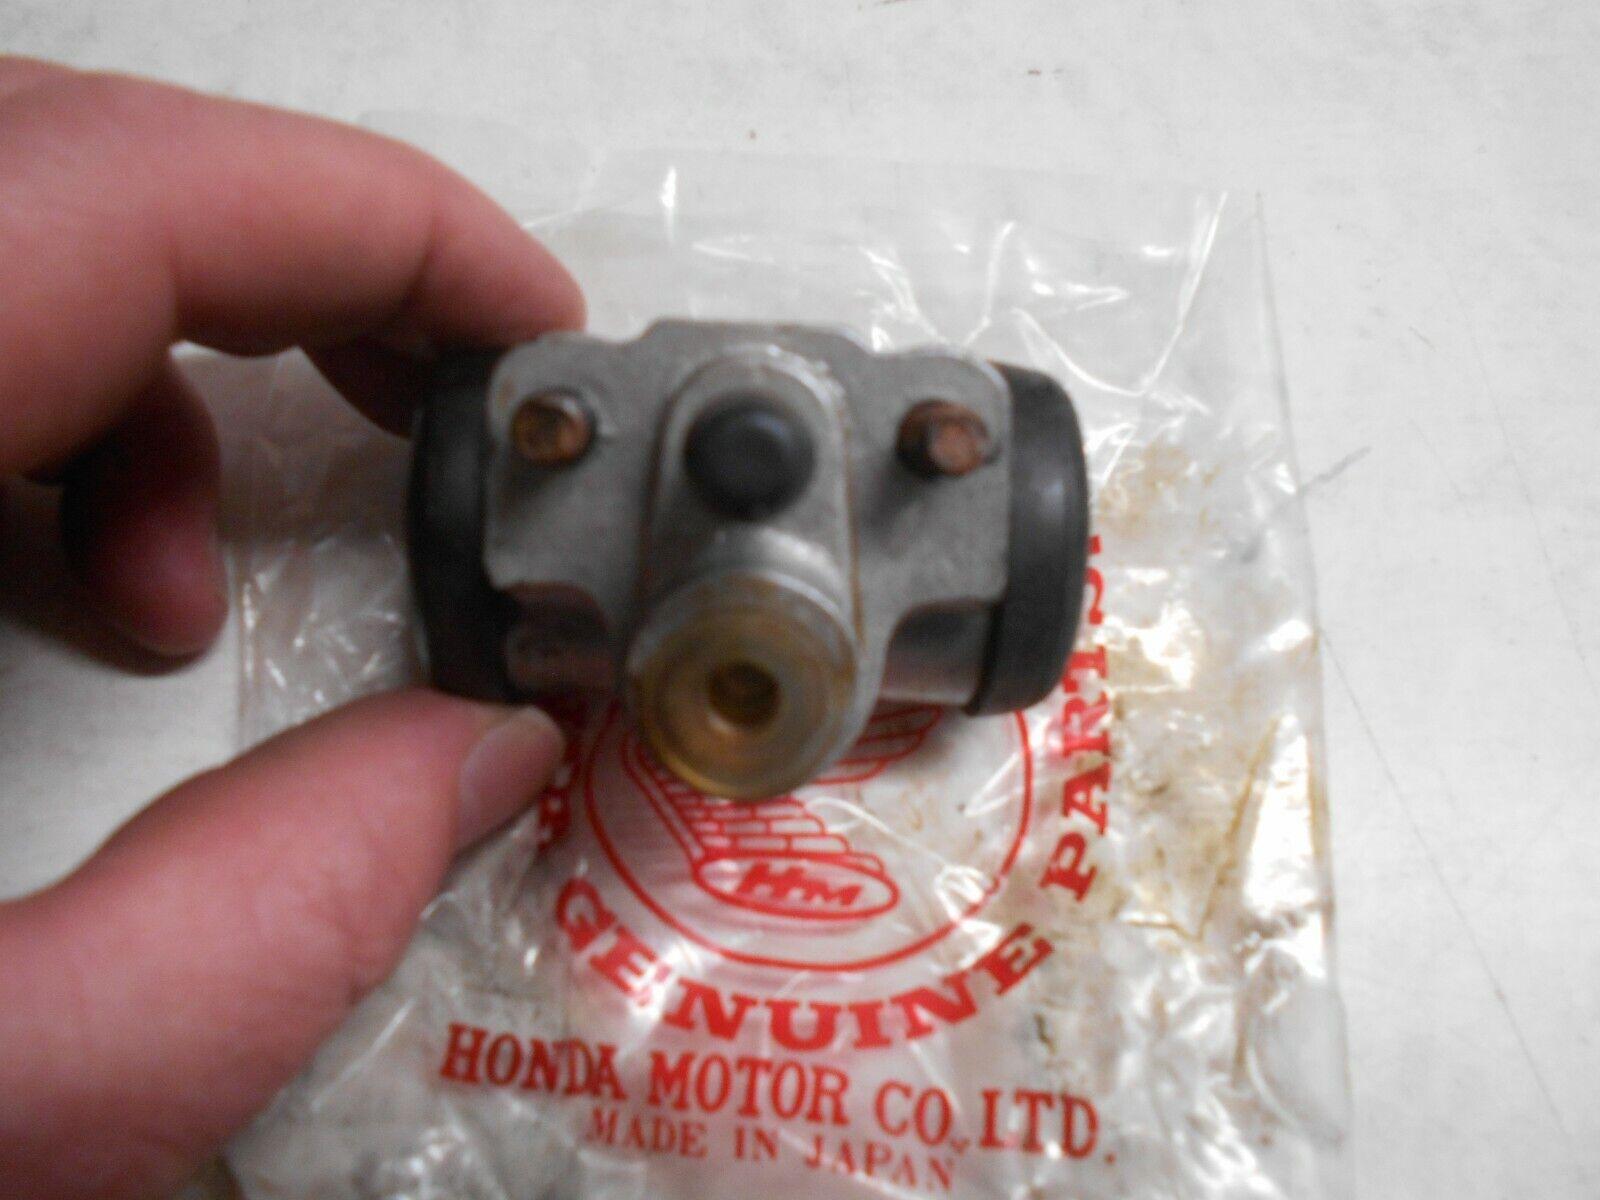 Car Parts - GENUINE HONDA CAR PARTS WHEEL CYLINDER ASSEMBLY N360 LIFE KT KQ KU 45300-611-003